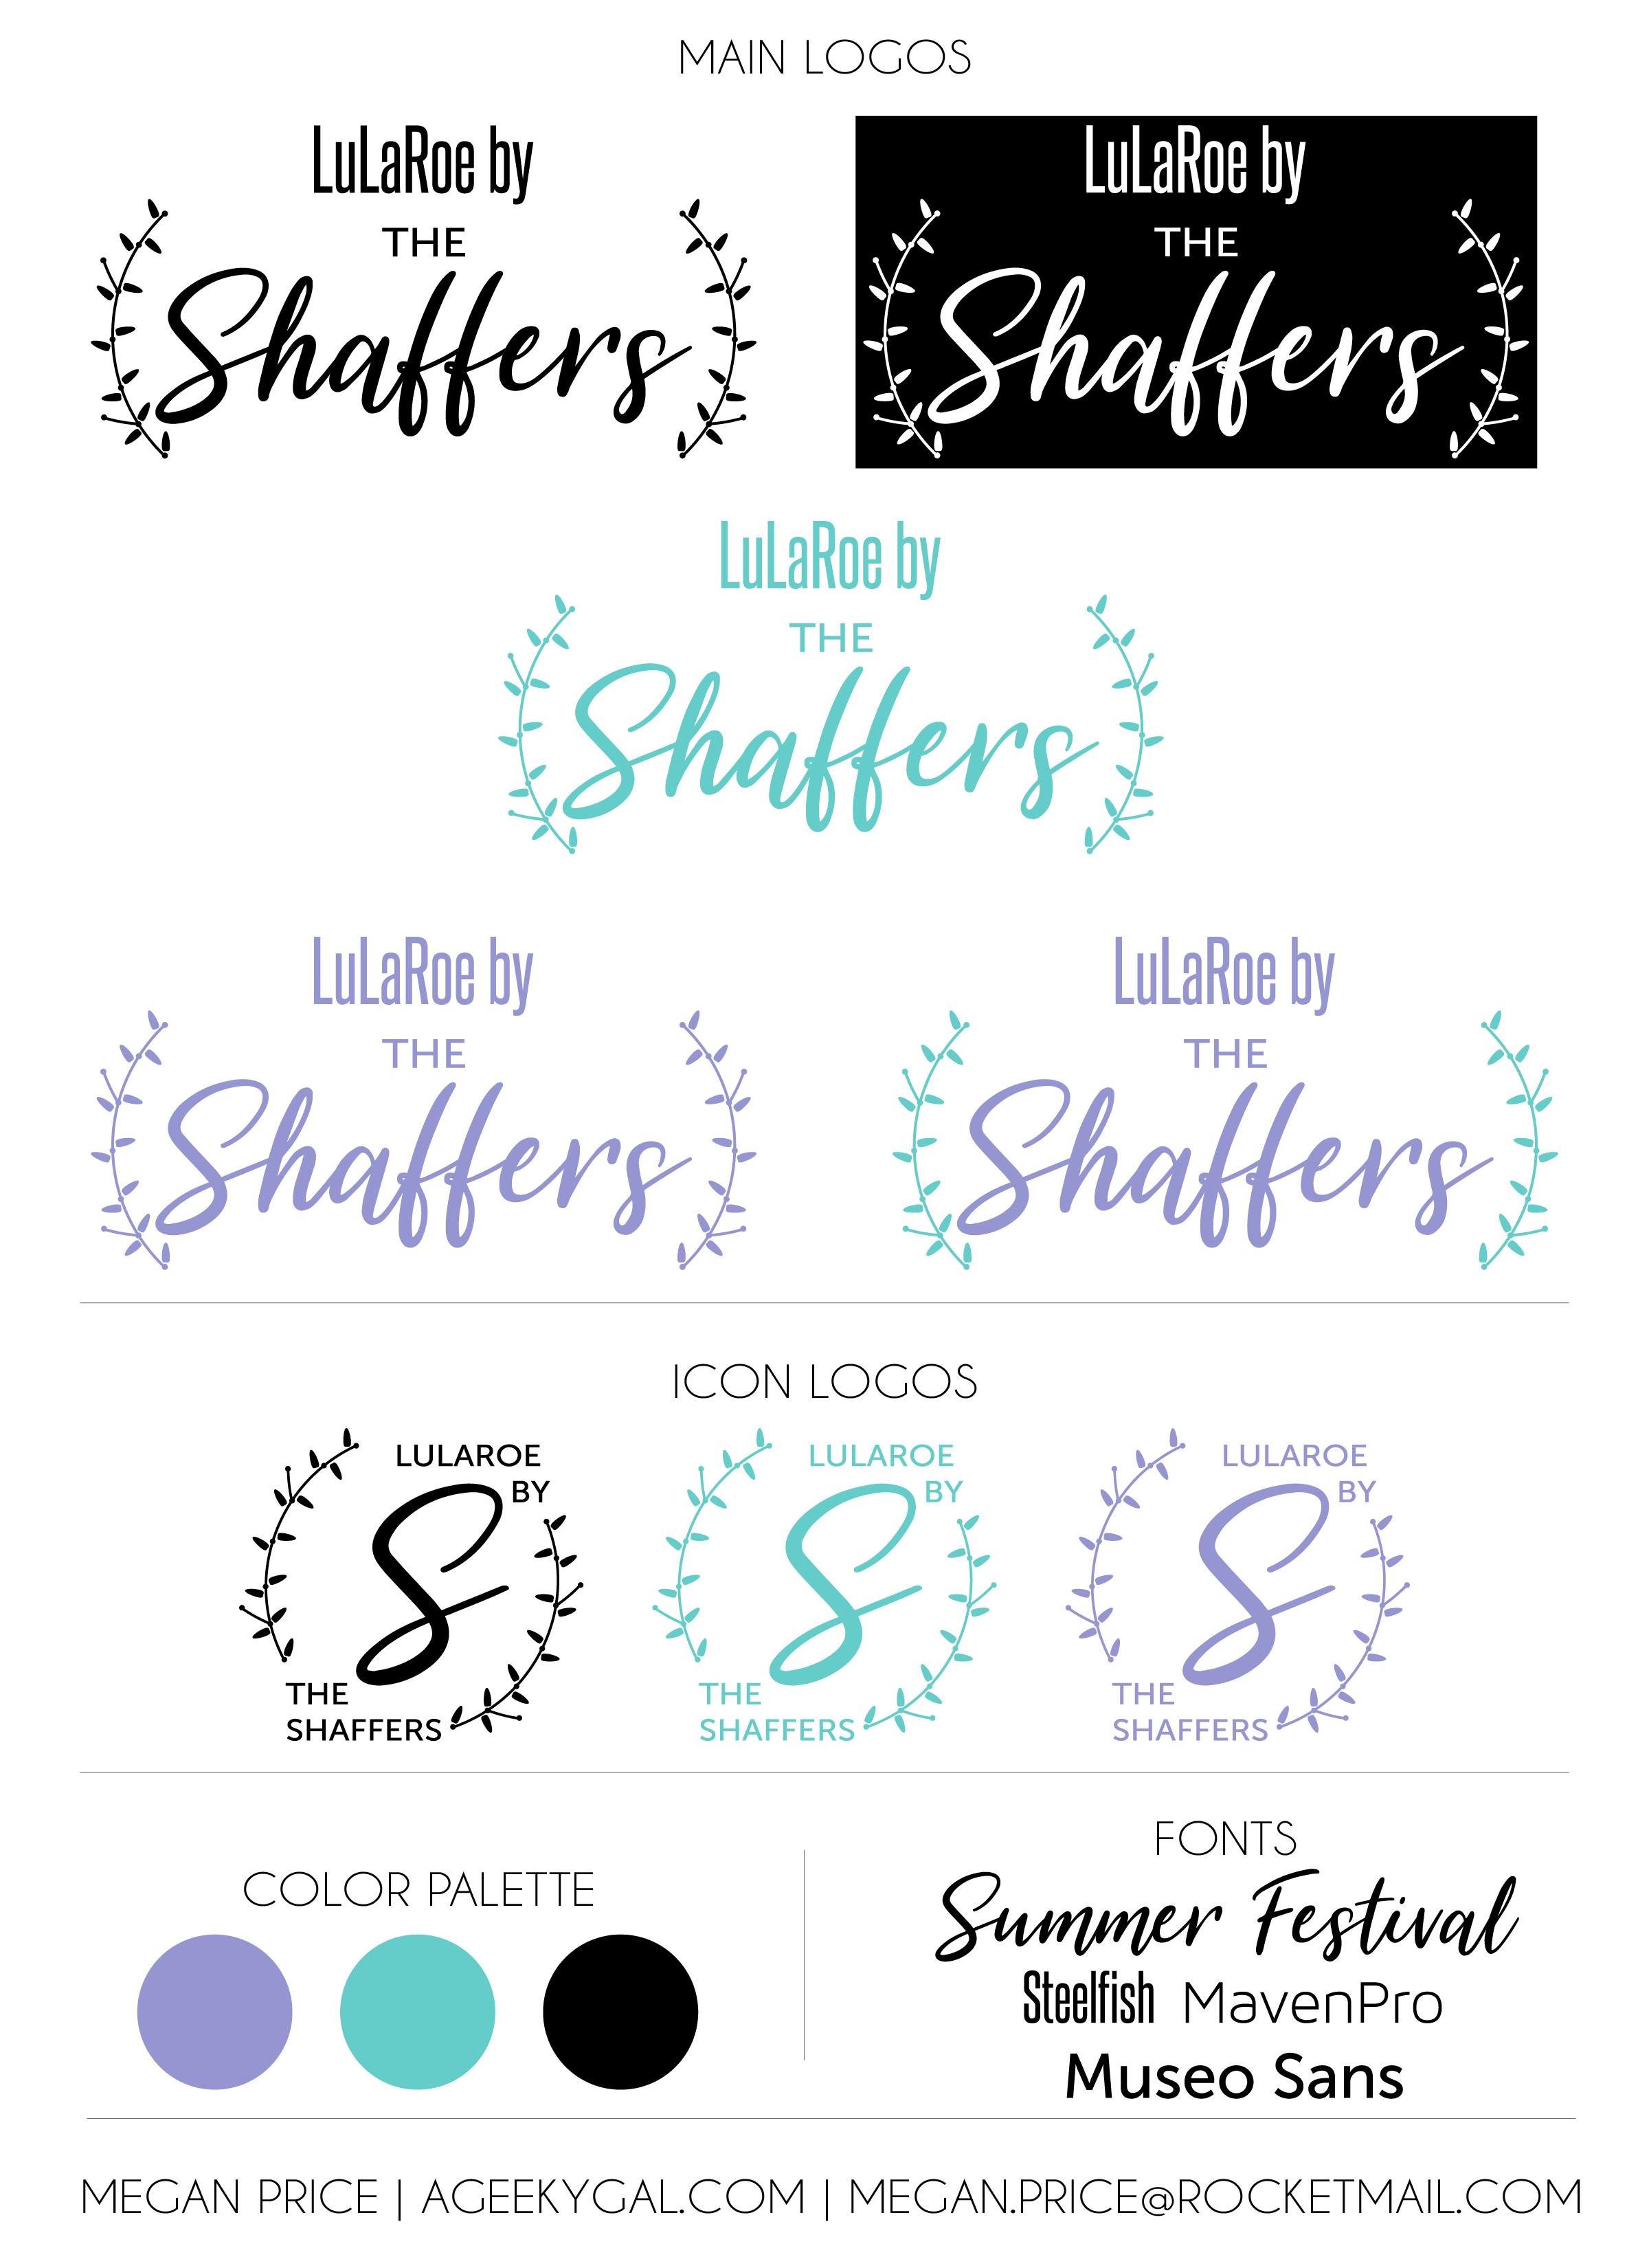 LuLaRoeTheShafffers_Logo Designs_Official Board.png